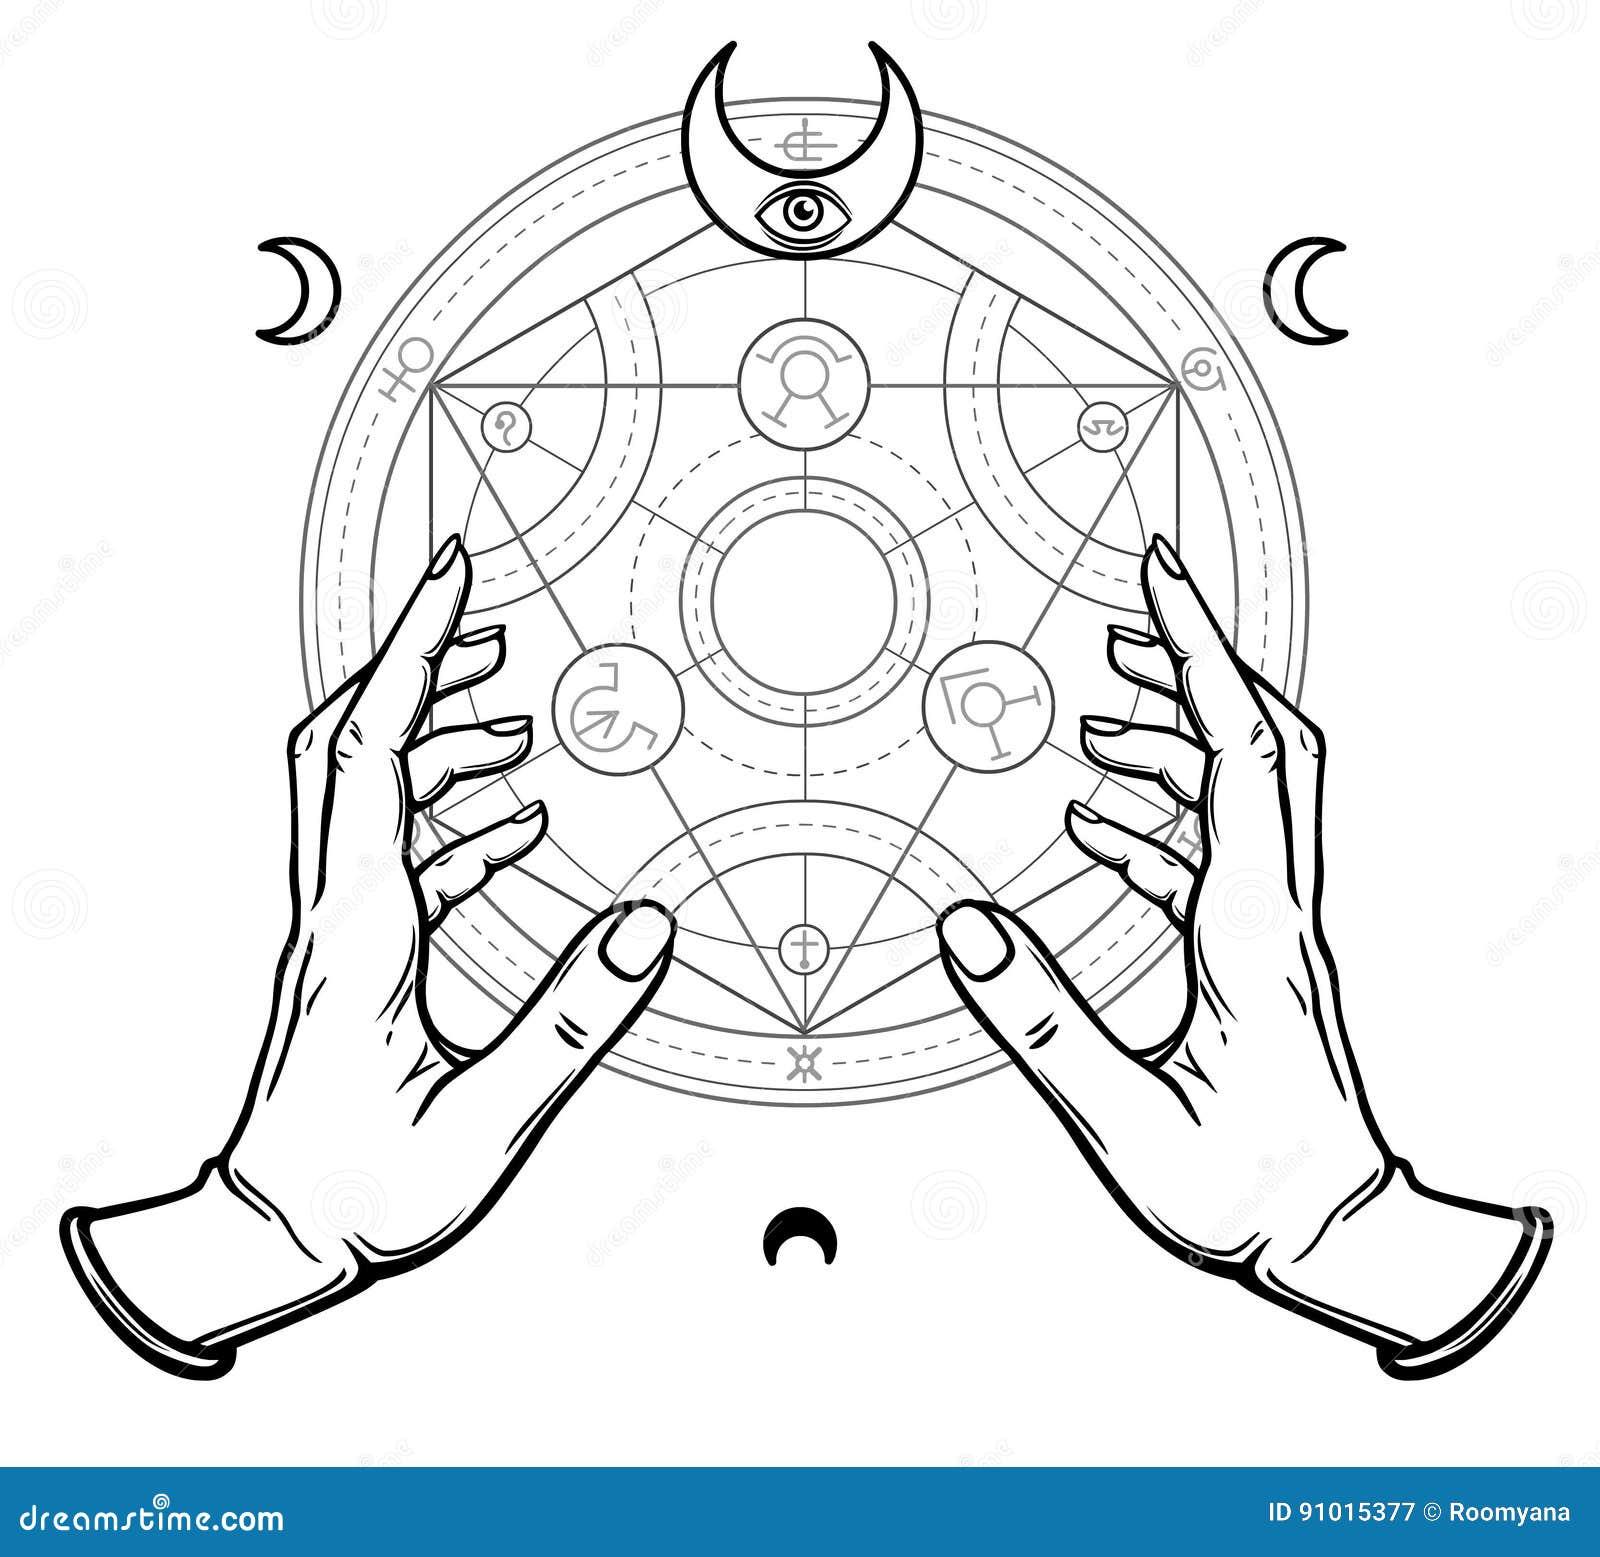 Alchemical symbols stock illustrations 128 alchemical symbols human hands touch an alchemical circle mystical symbols sacred geometry vector illustration isolated biocorpaavc Choice Image